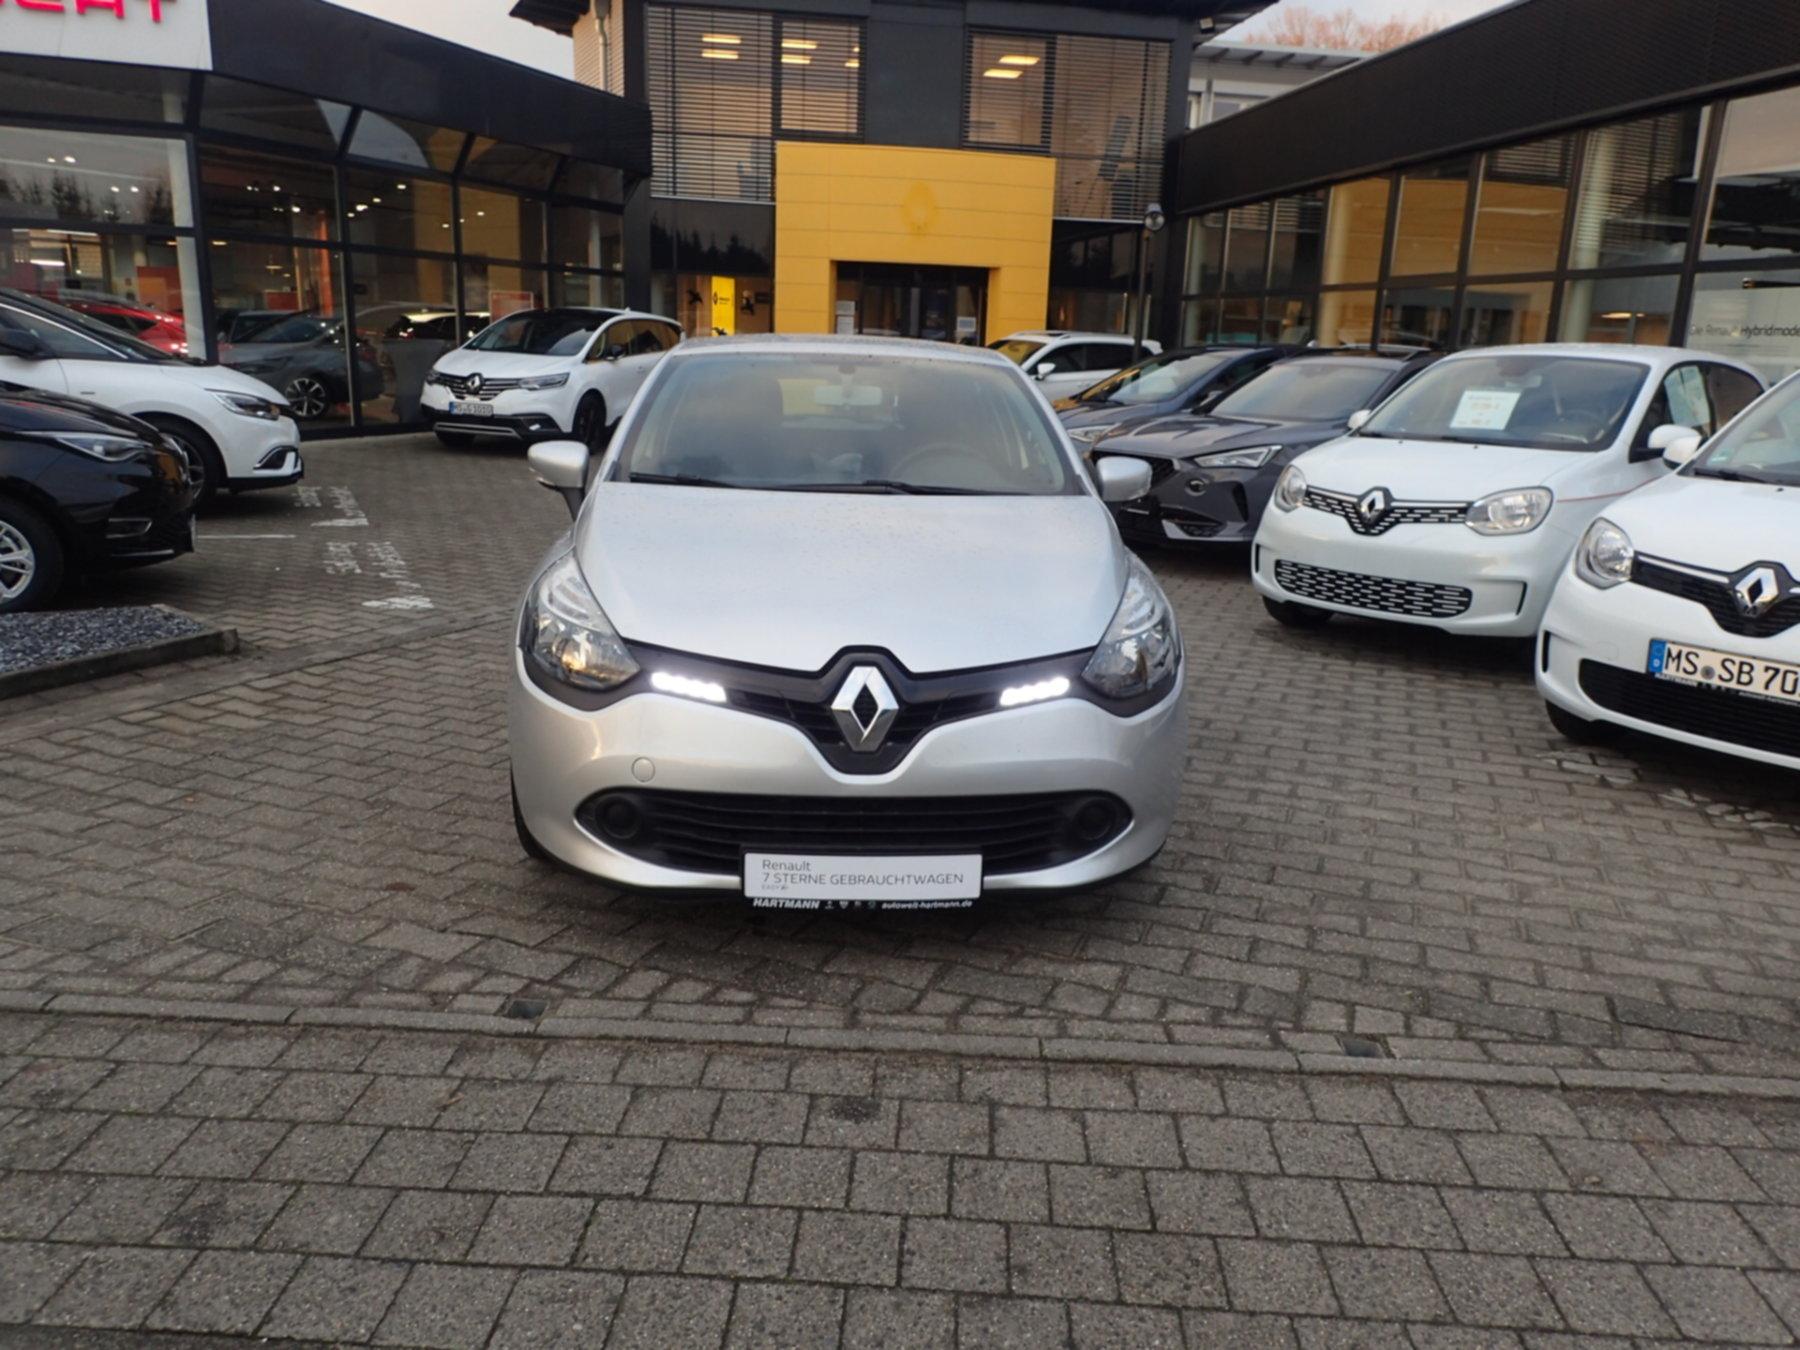 Renault Clio Expression 1.2 16V 75 Klang & Klima Paket, Jahr 2014, Benzin